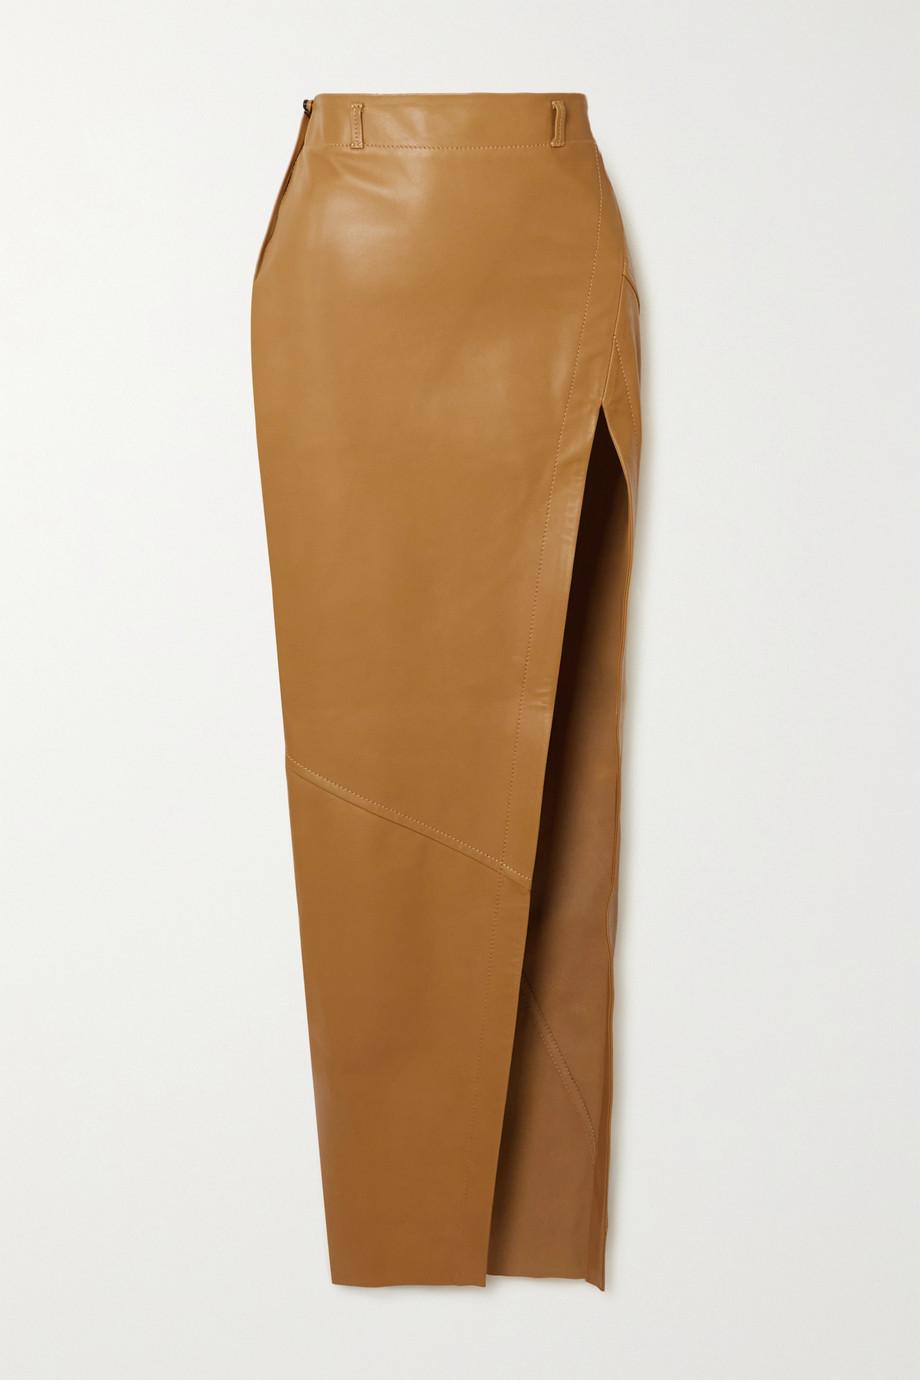 Petar Petrov Ryan paneled leather maxi skirt